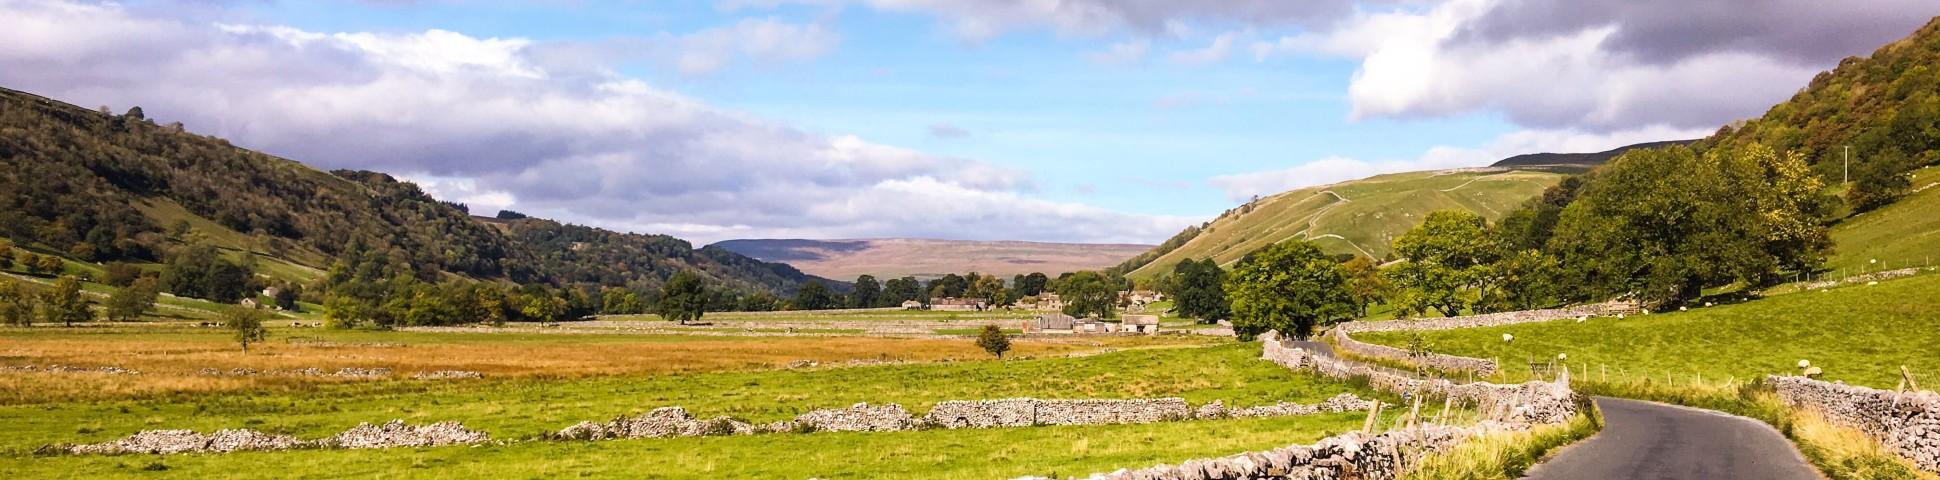 Yorkshire (England)